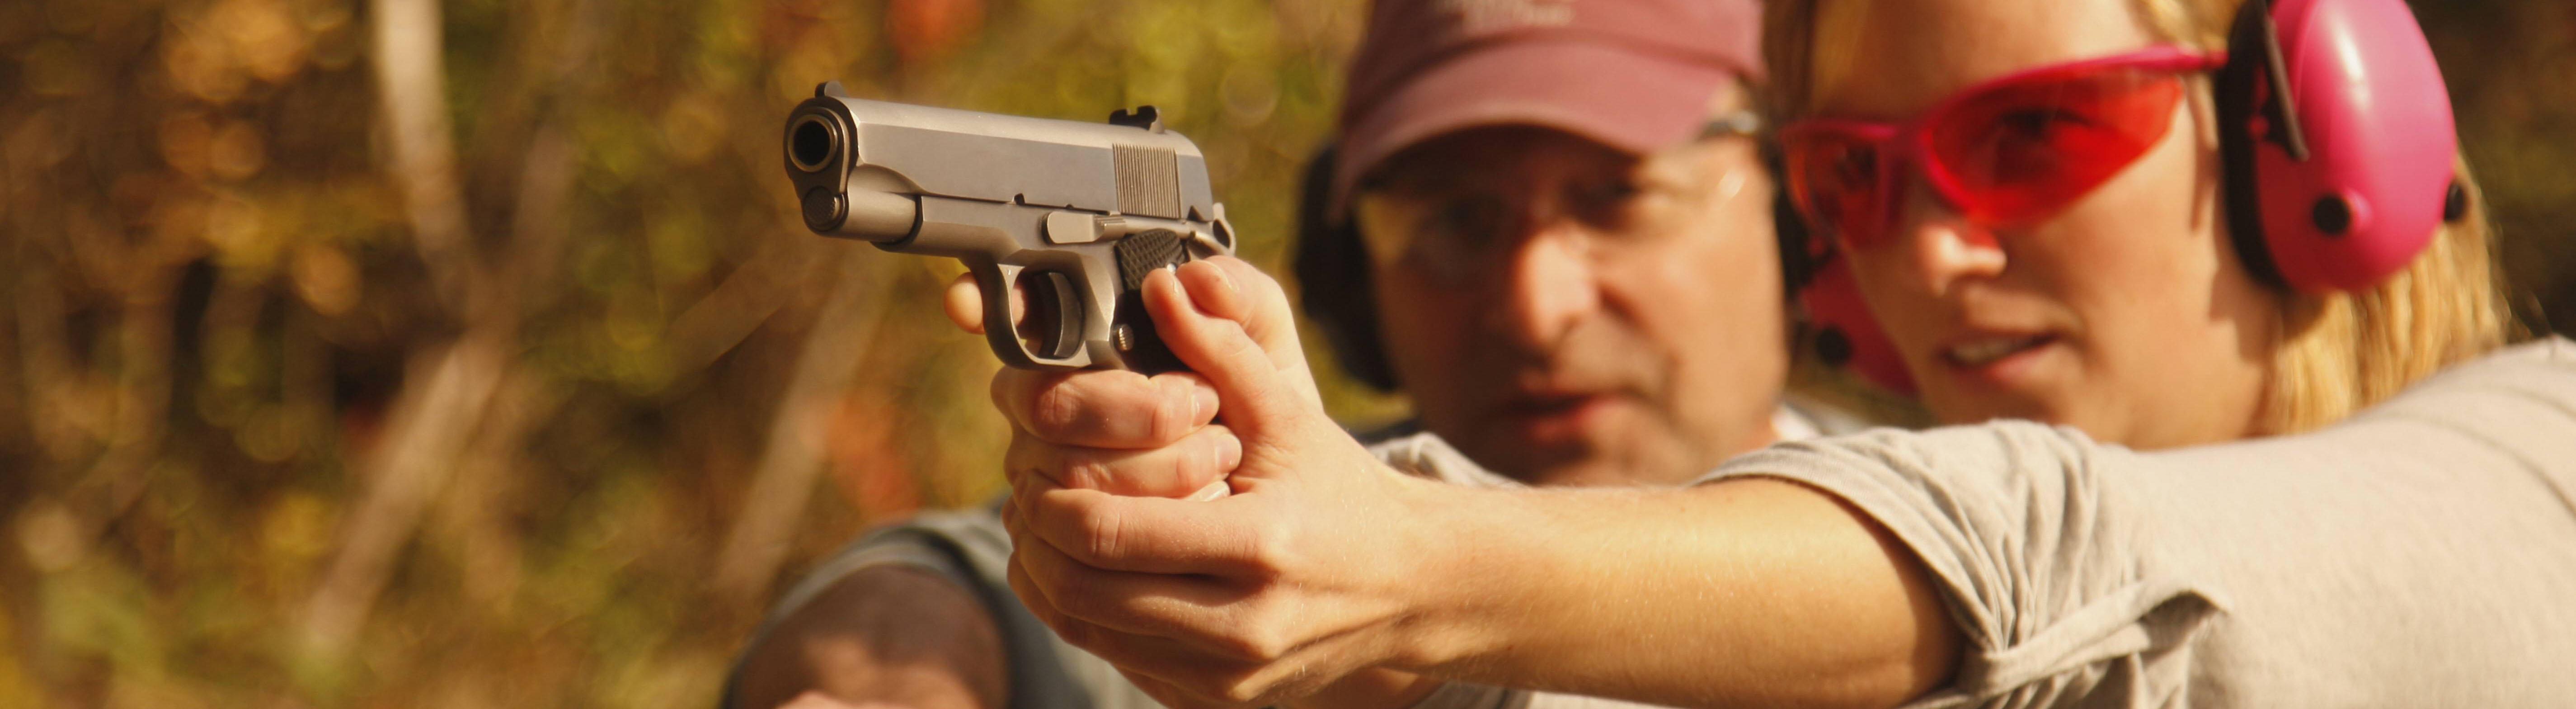 Frau übt in USA an Schusswaffe.